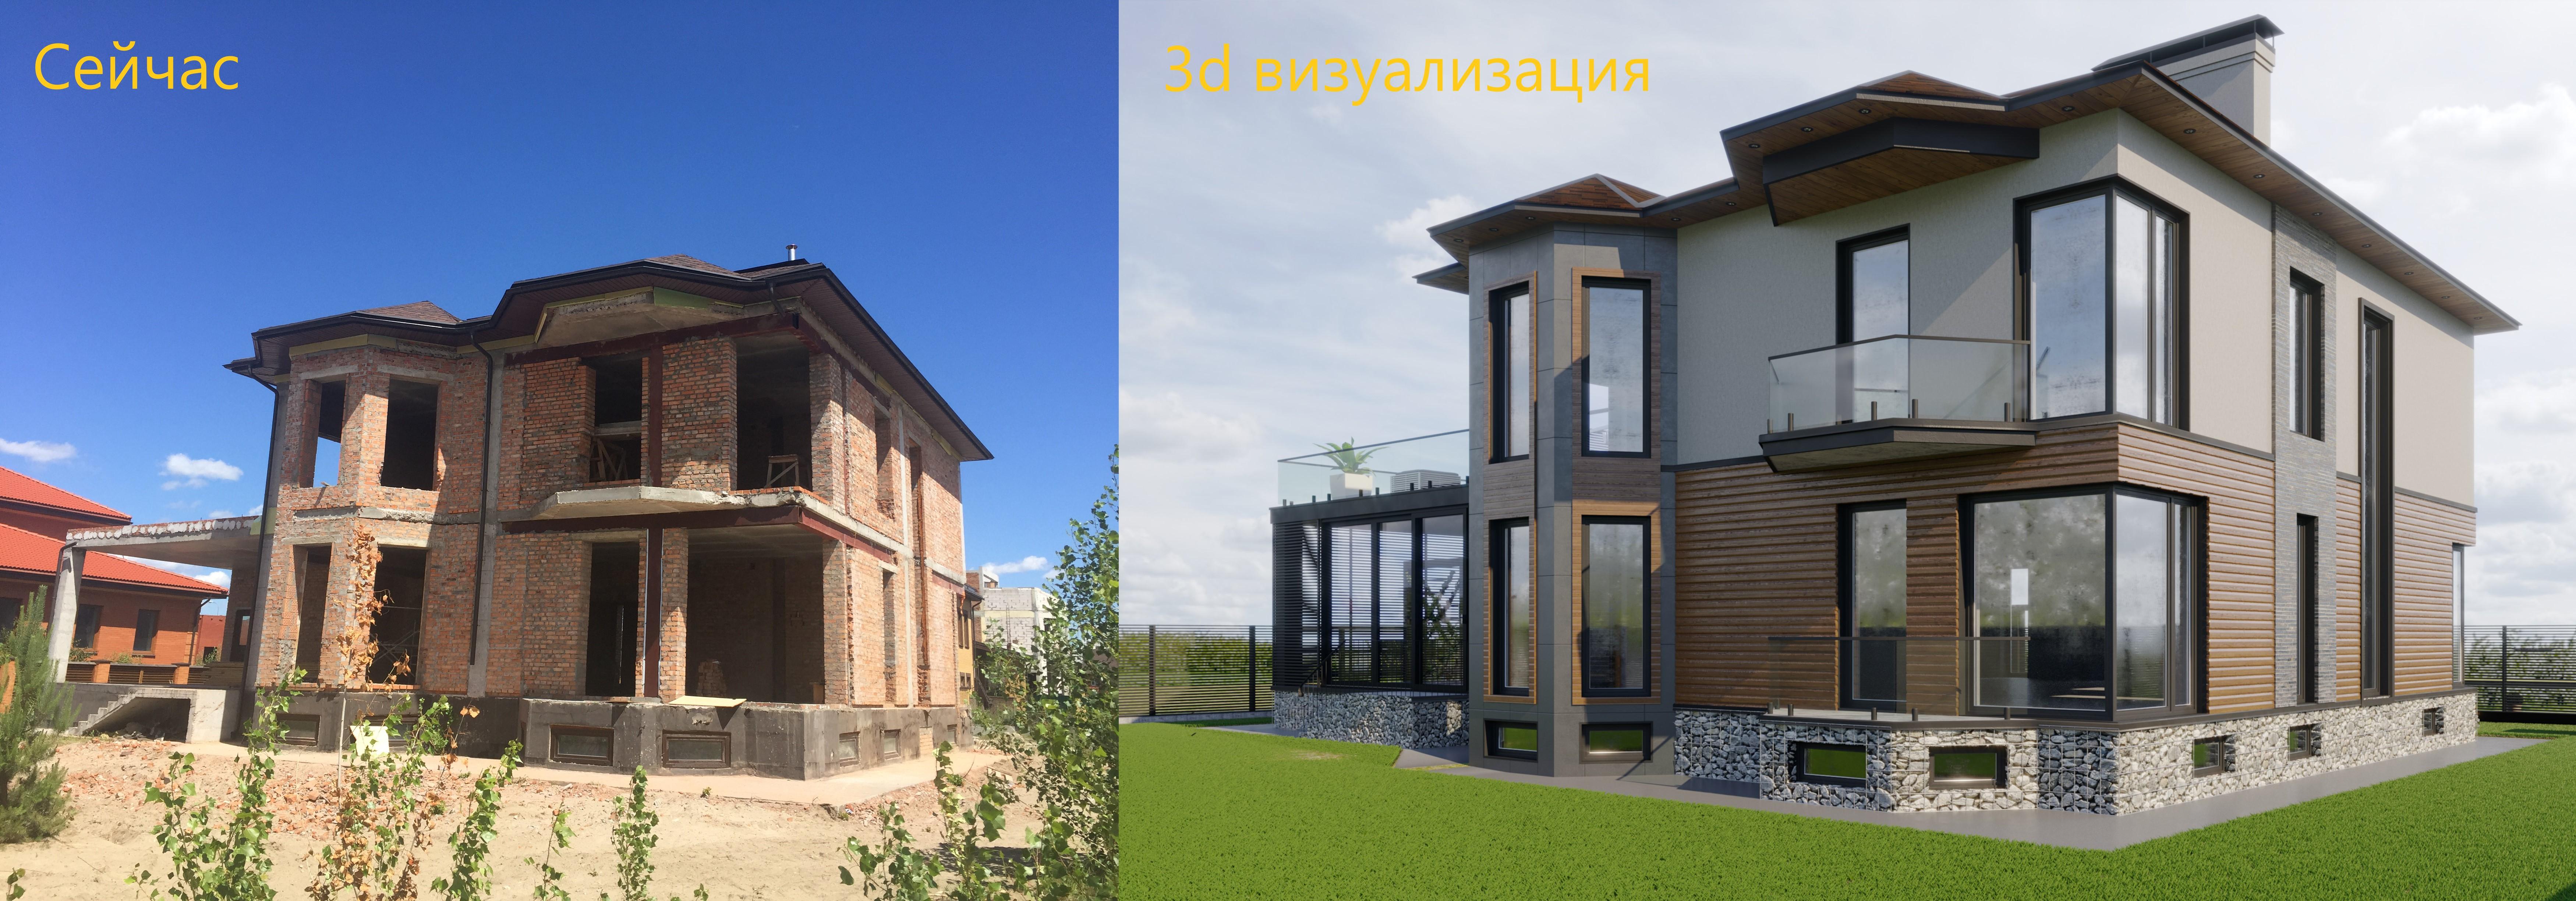 Дизайн проект. Ирина Терещенко. Троещина, слайд 1.